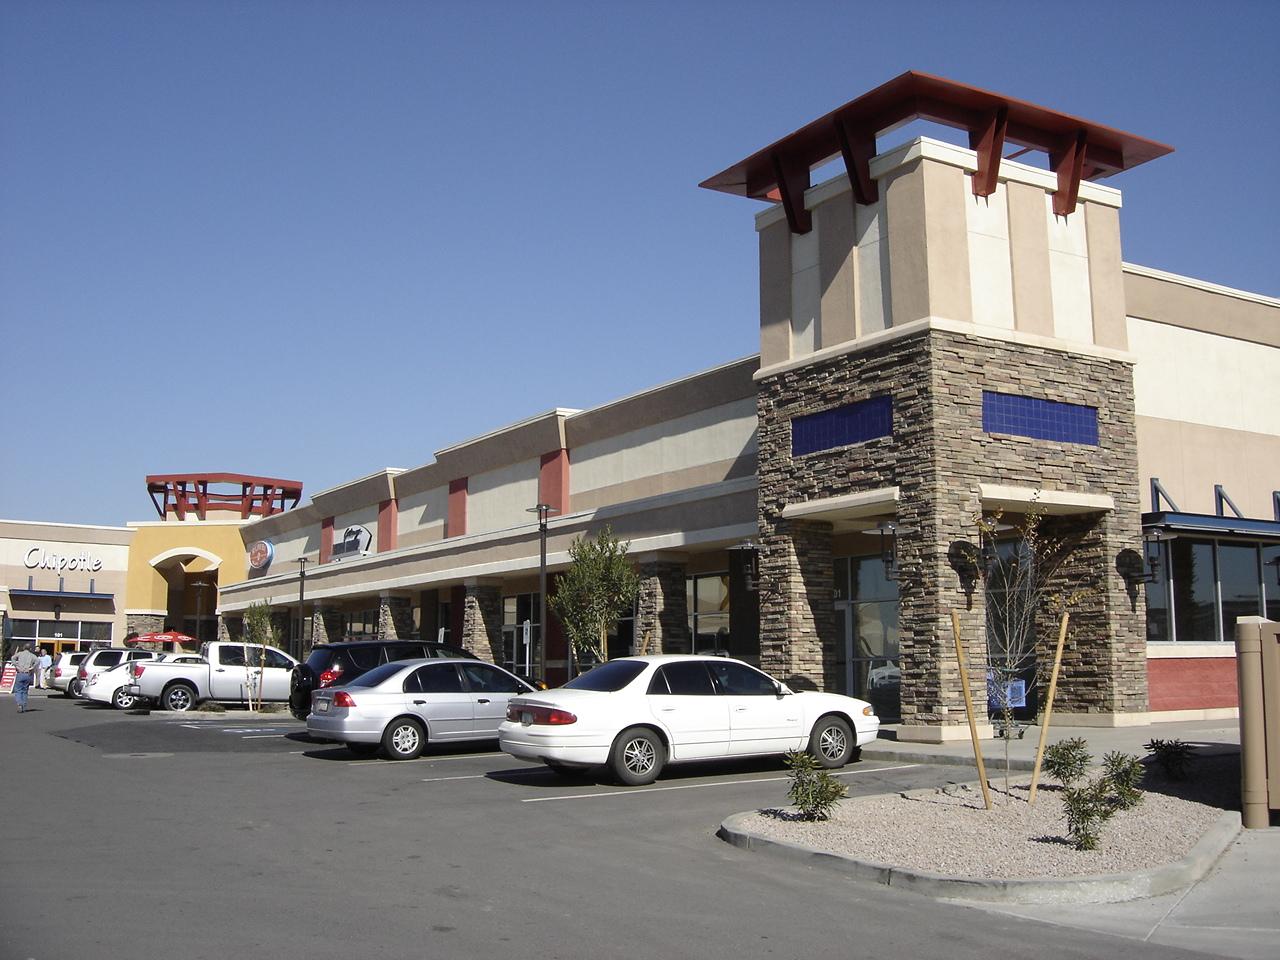 ADW-Retail-Restaurant-Gateway-Crossing-Avondale-AZ-Exterior-2.jpg